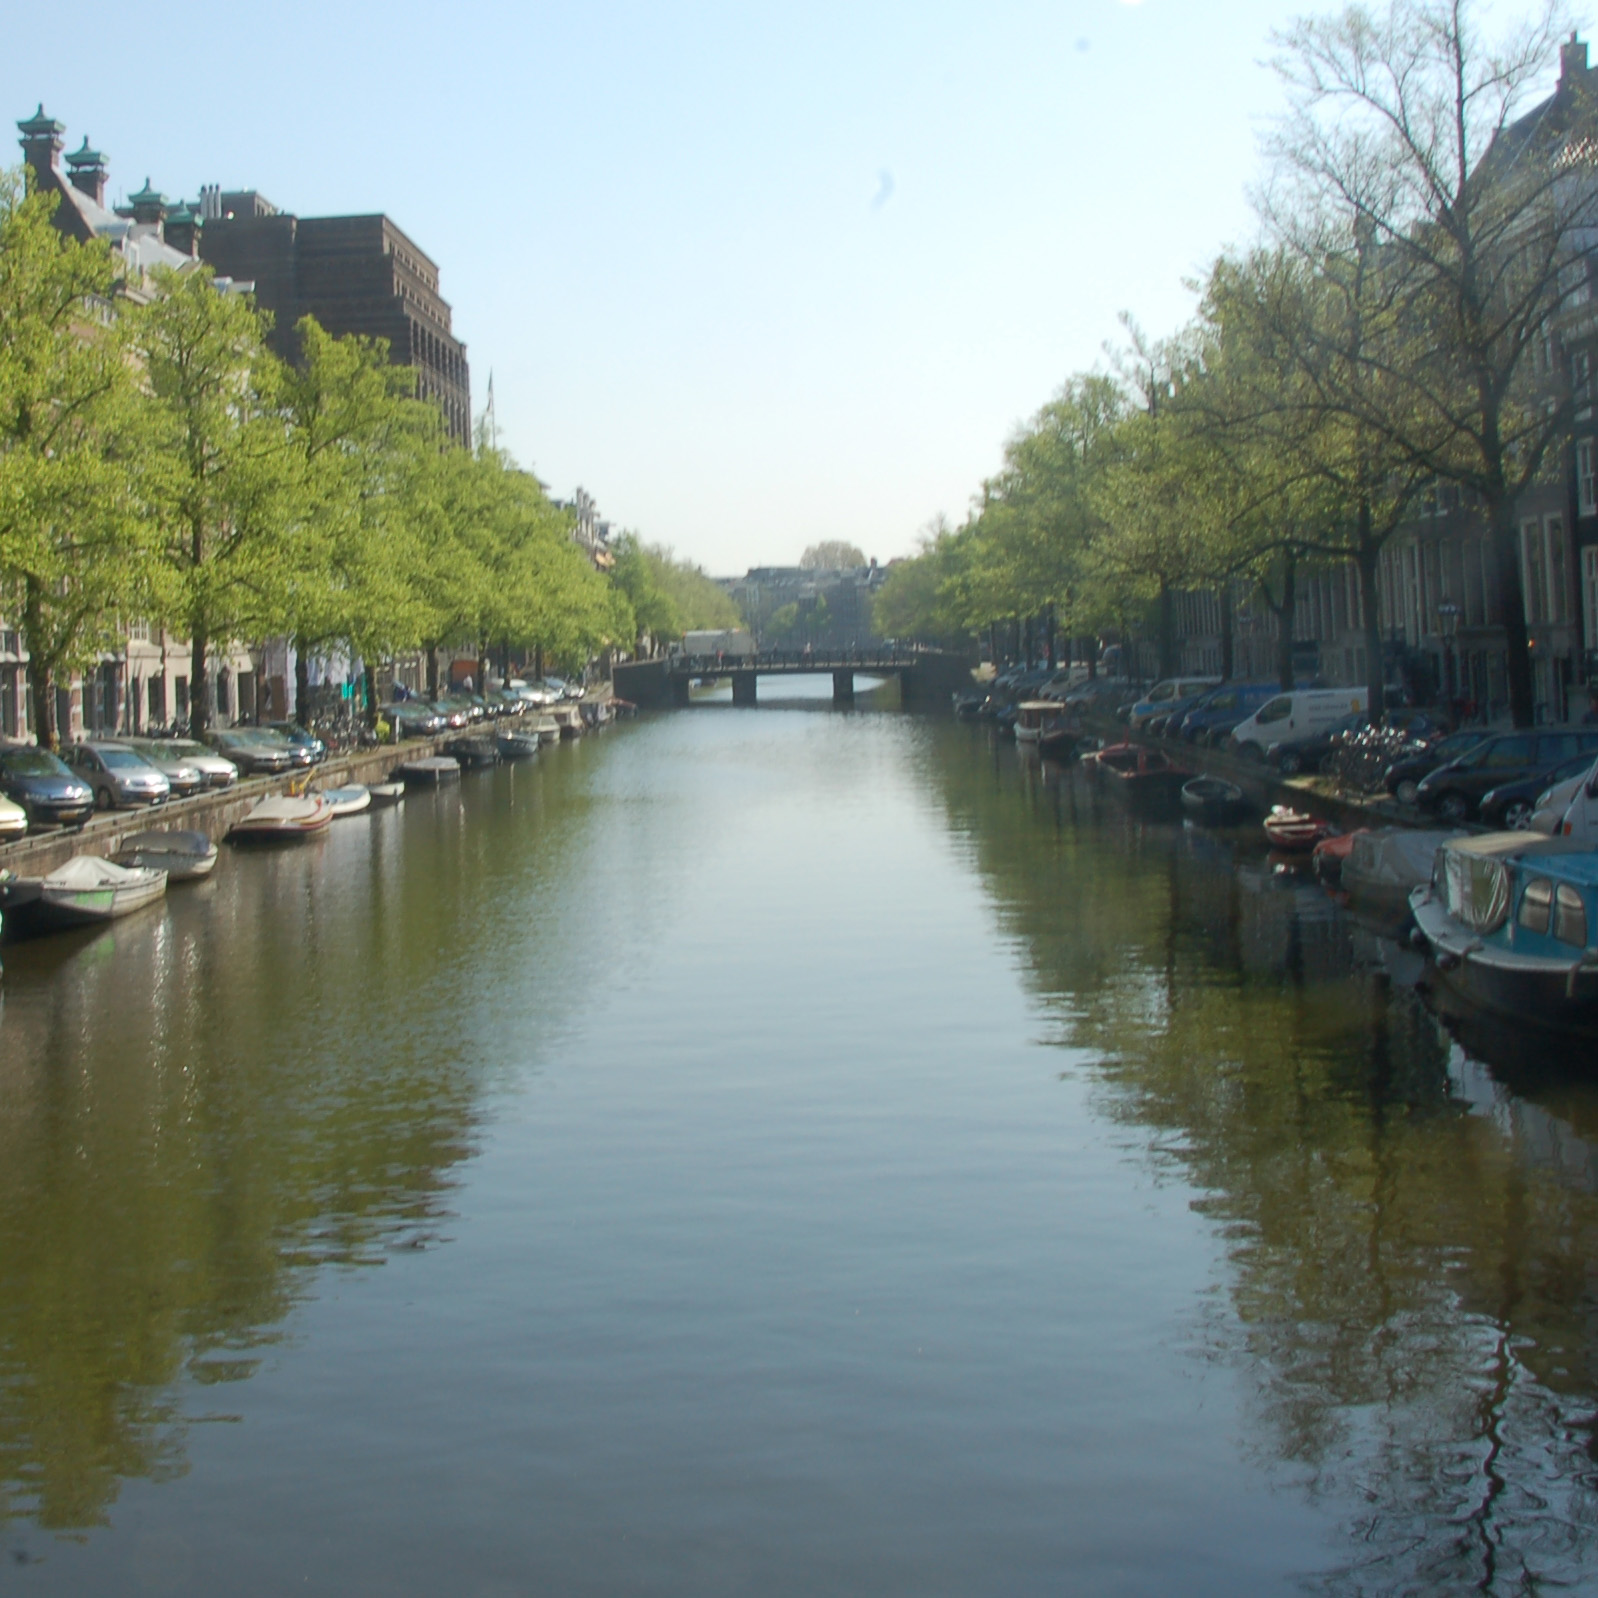 Antonio Clemente went to Amsterdam